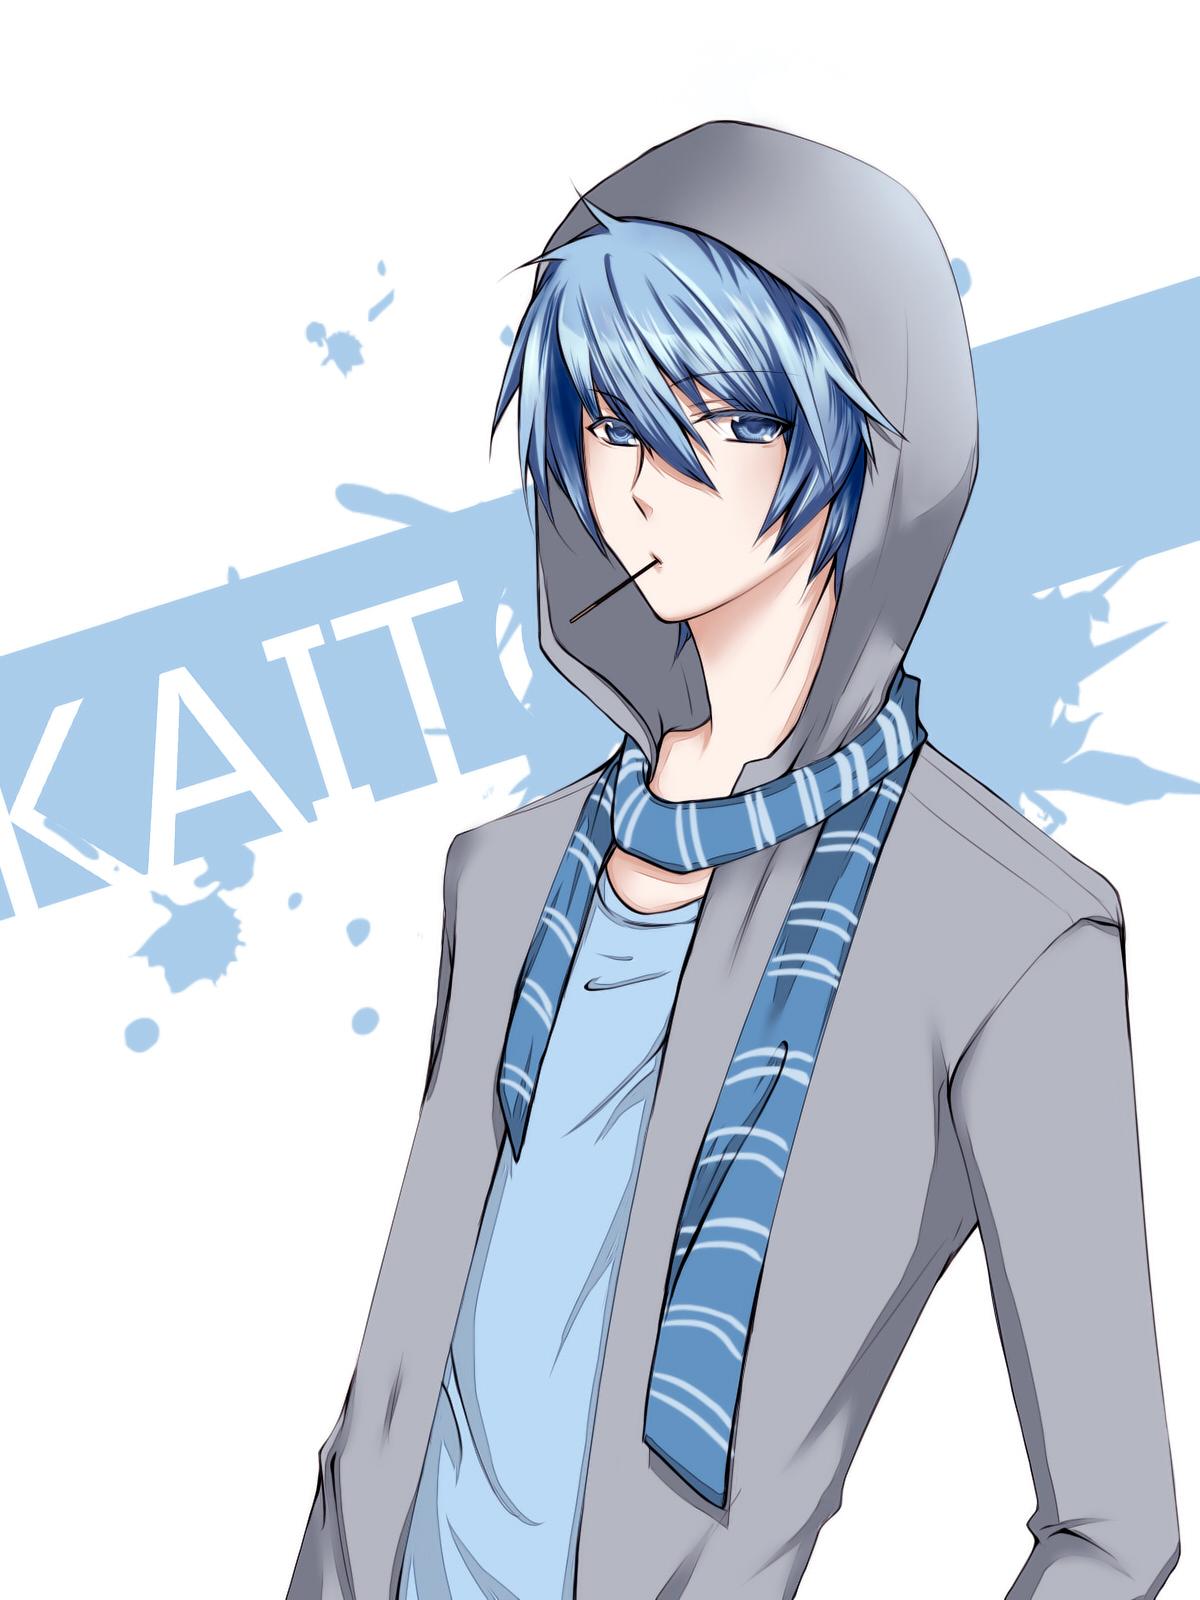 Vocaloid Mokaito KAITO/#983230 - Zeroch...